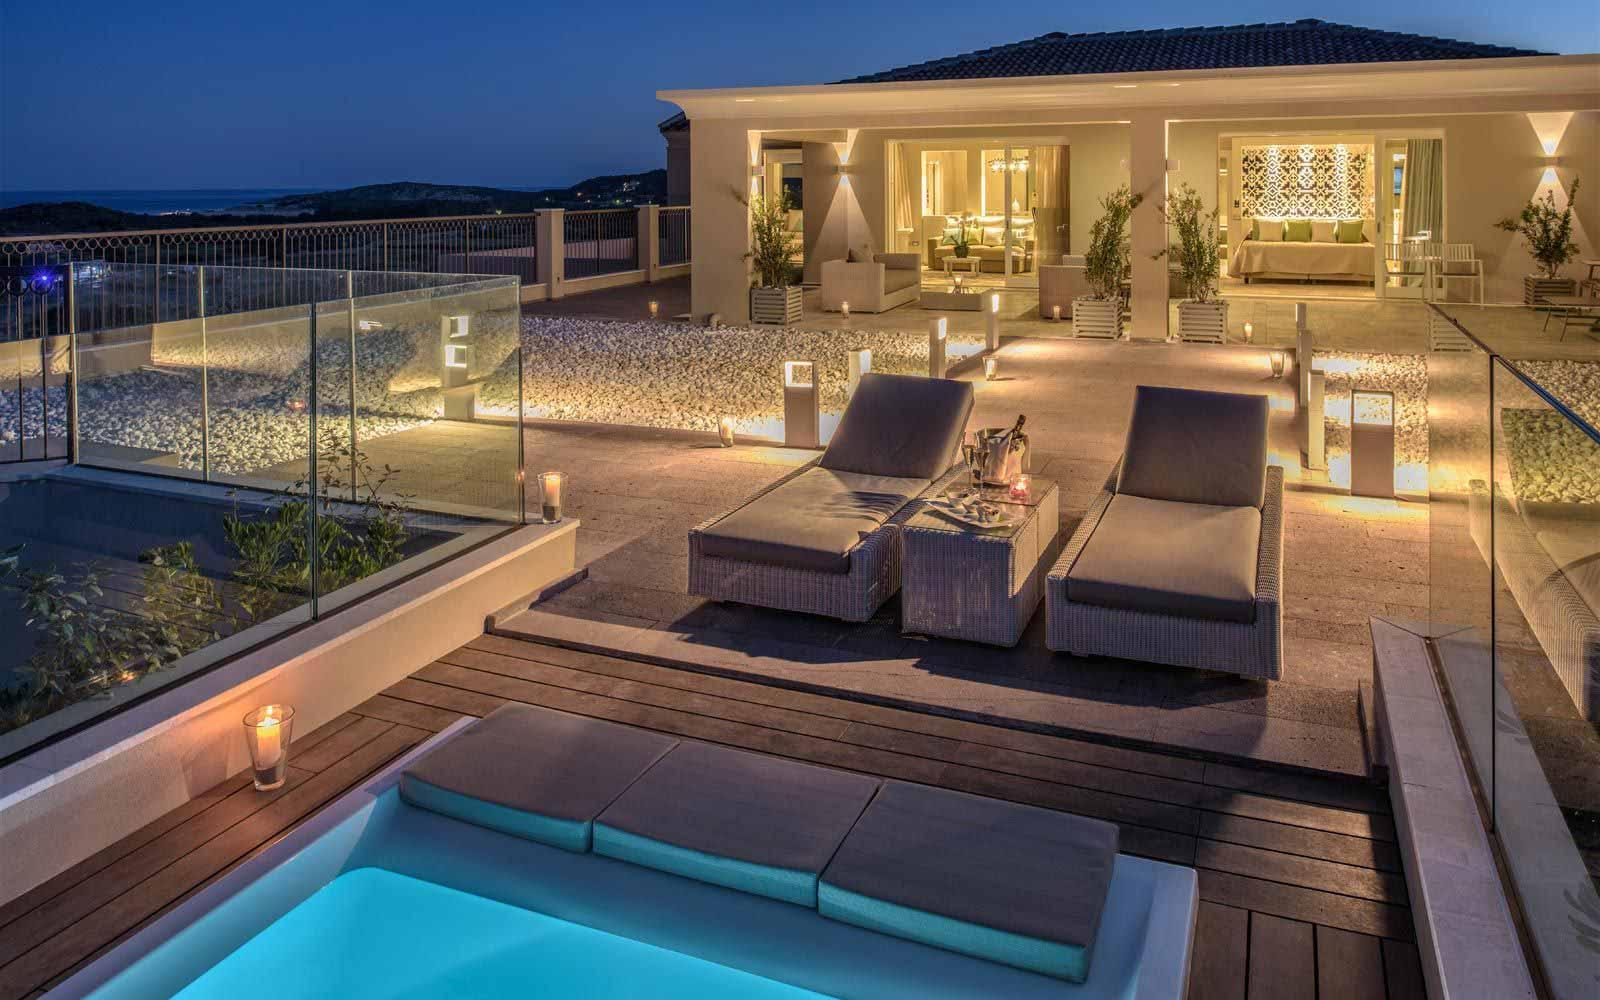 Luxury Panorama Suite at night